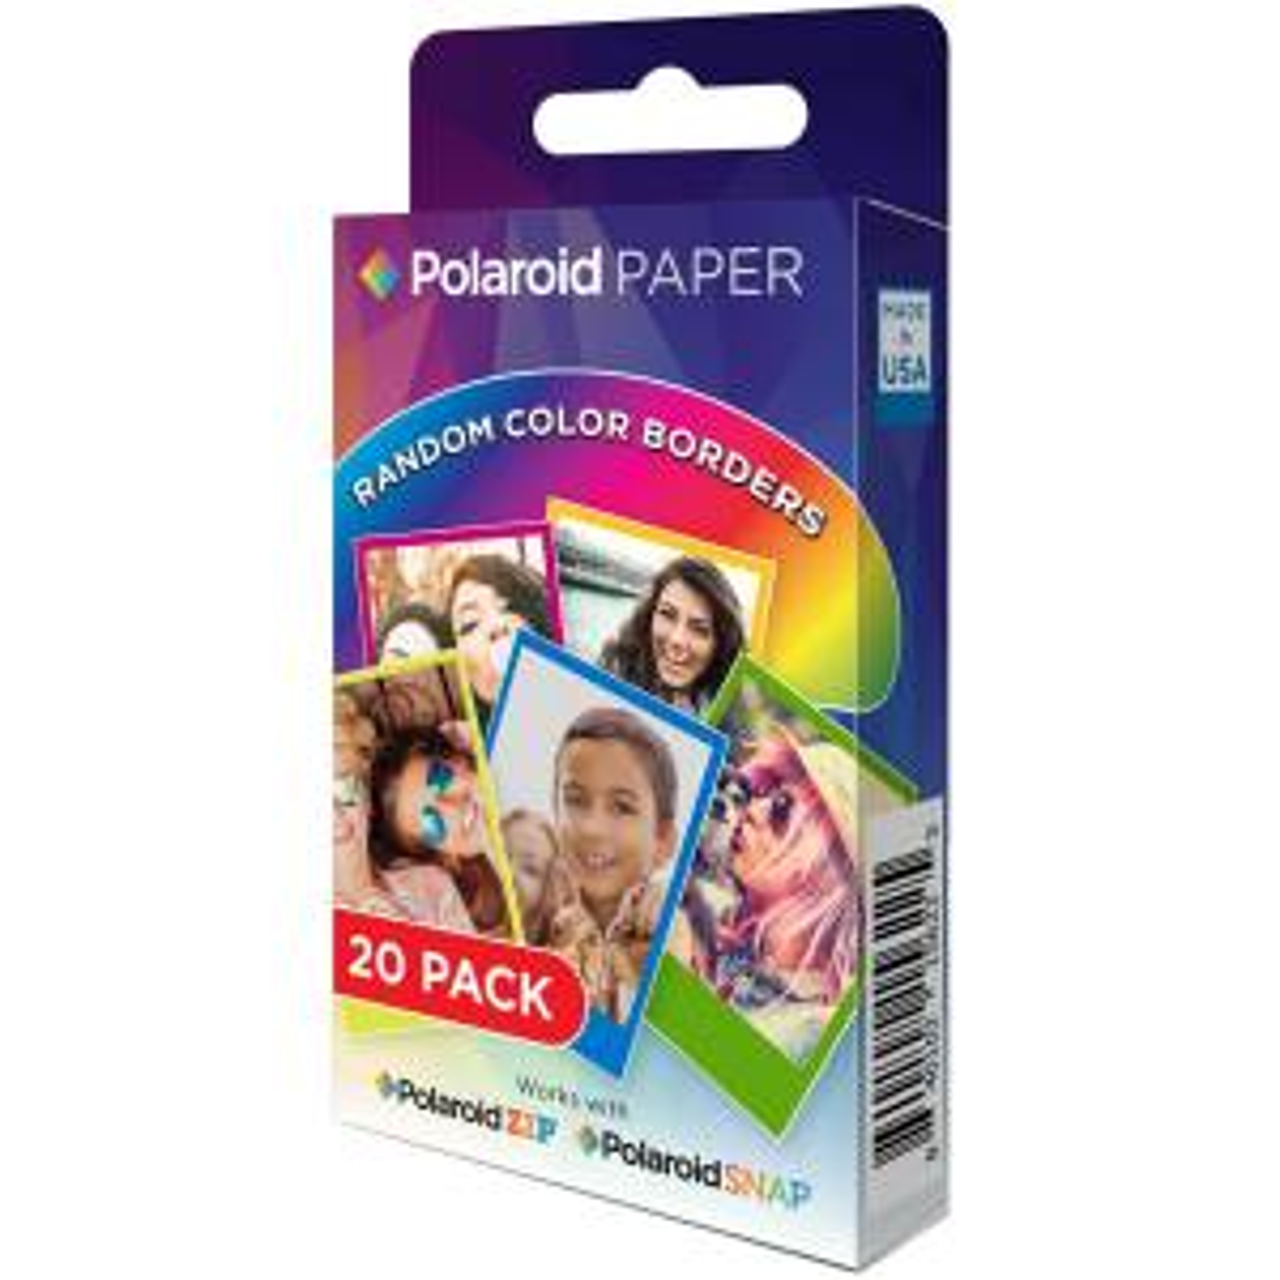 کاغذ چاپ سریع پولاروید مدل Rainbow Border ZINK سایز  2x3 اینچ بسته 20 عددی